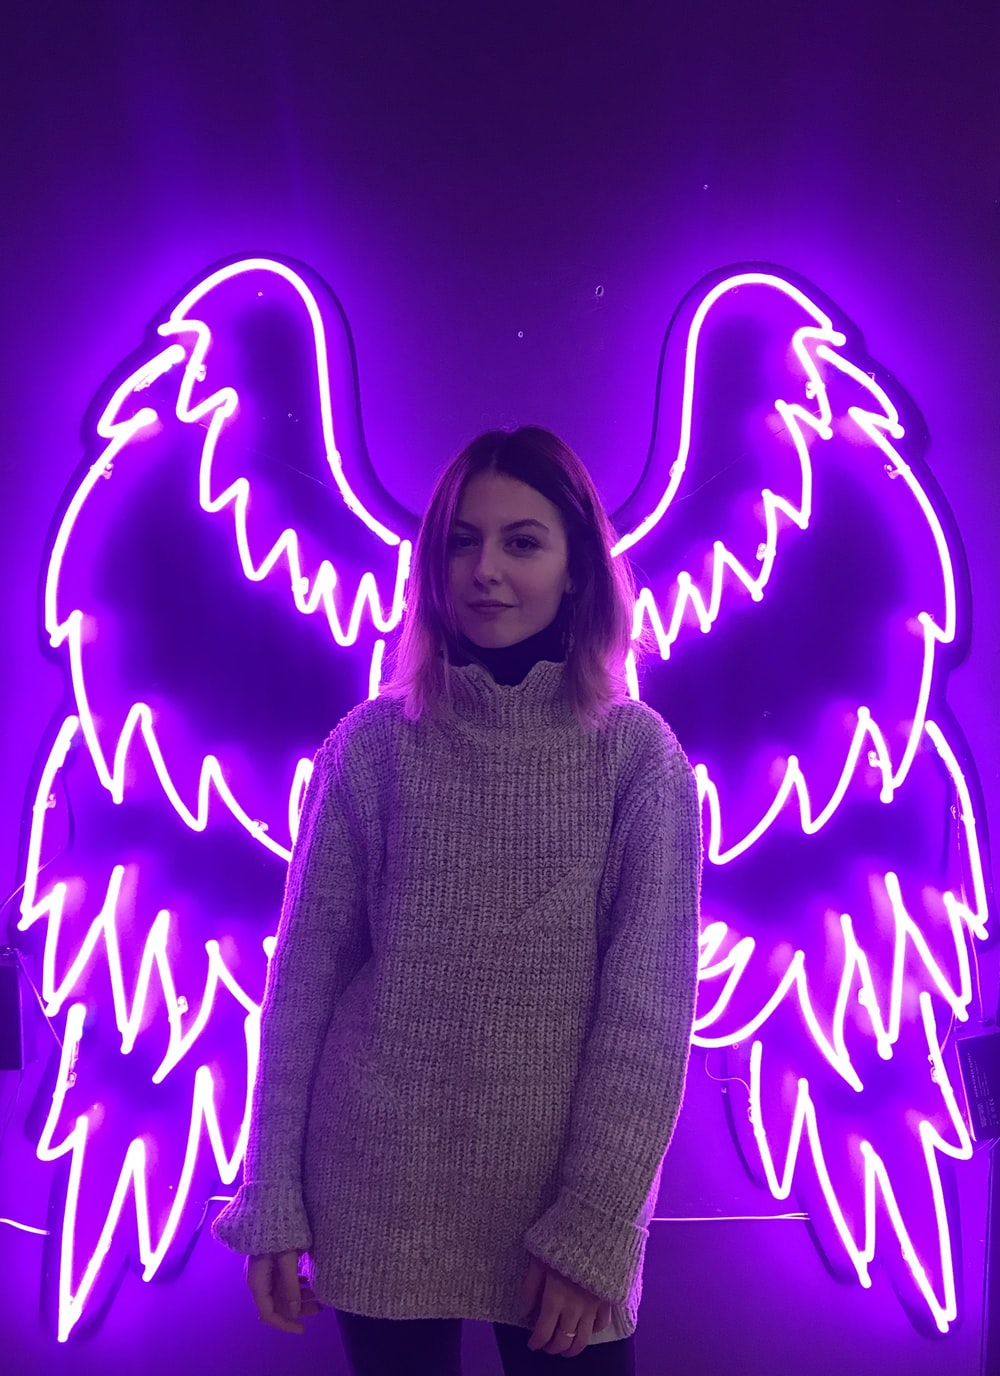 woman standing in front of purple wings neon light